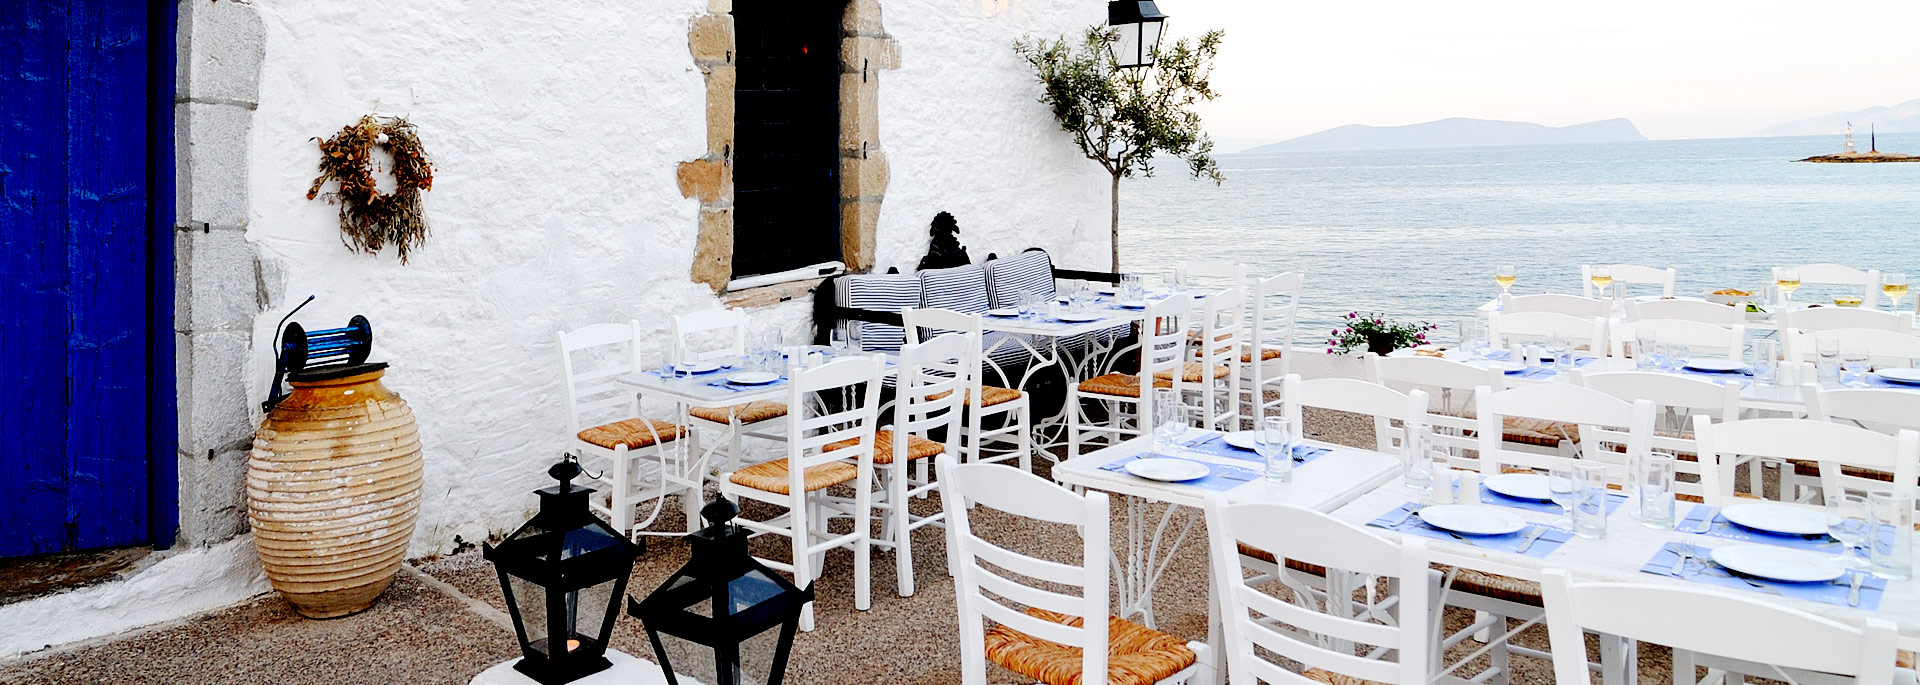 spetses-restaurant-orloff-02